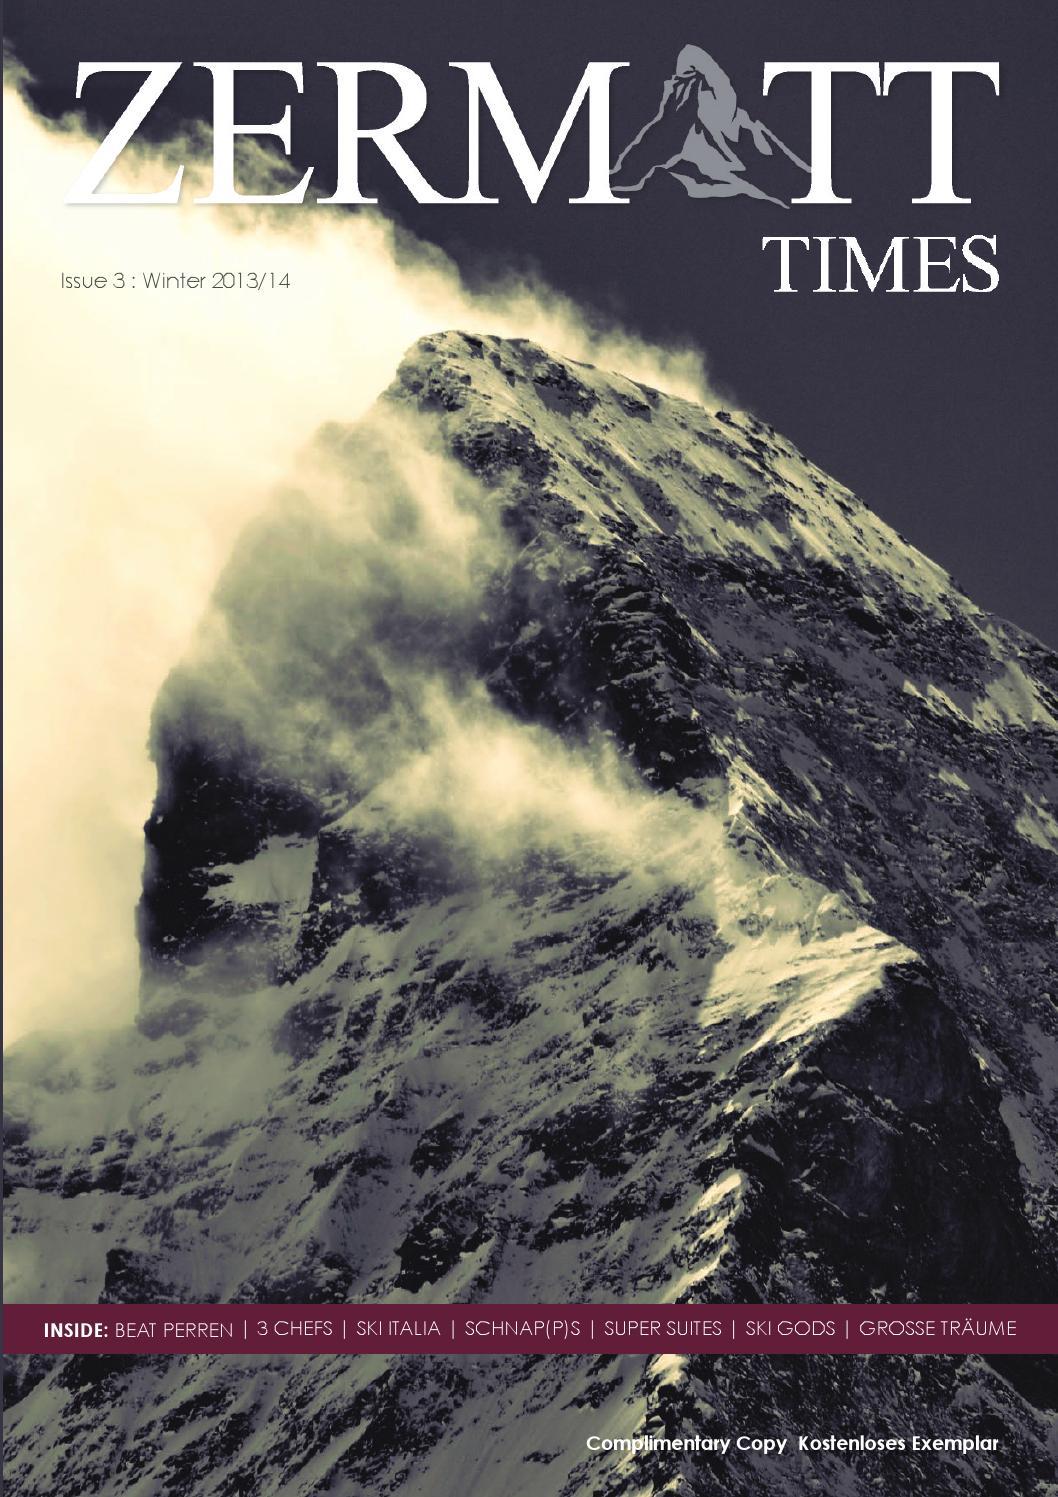 Zermatt Times 3 Winter 2013 by The Magazine Production Company - issuu